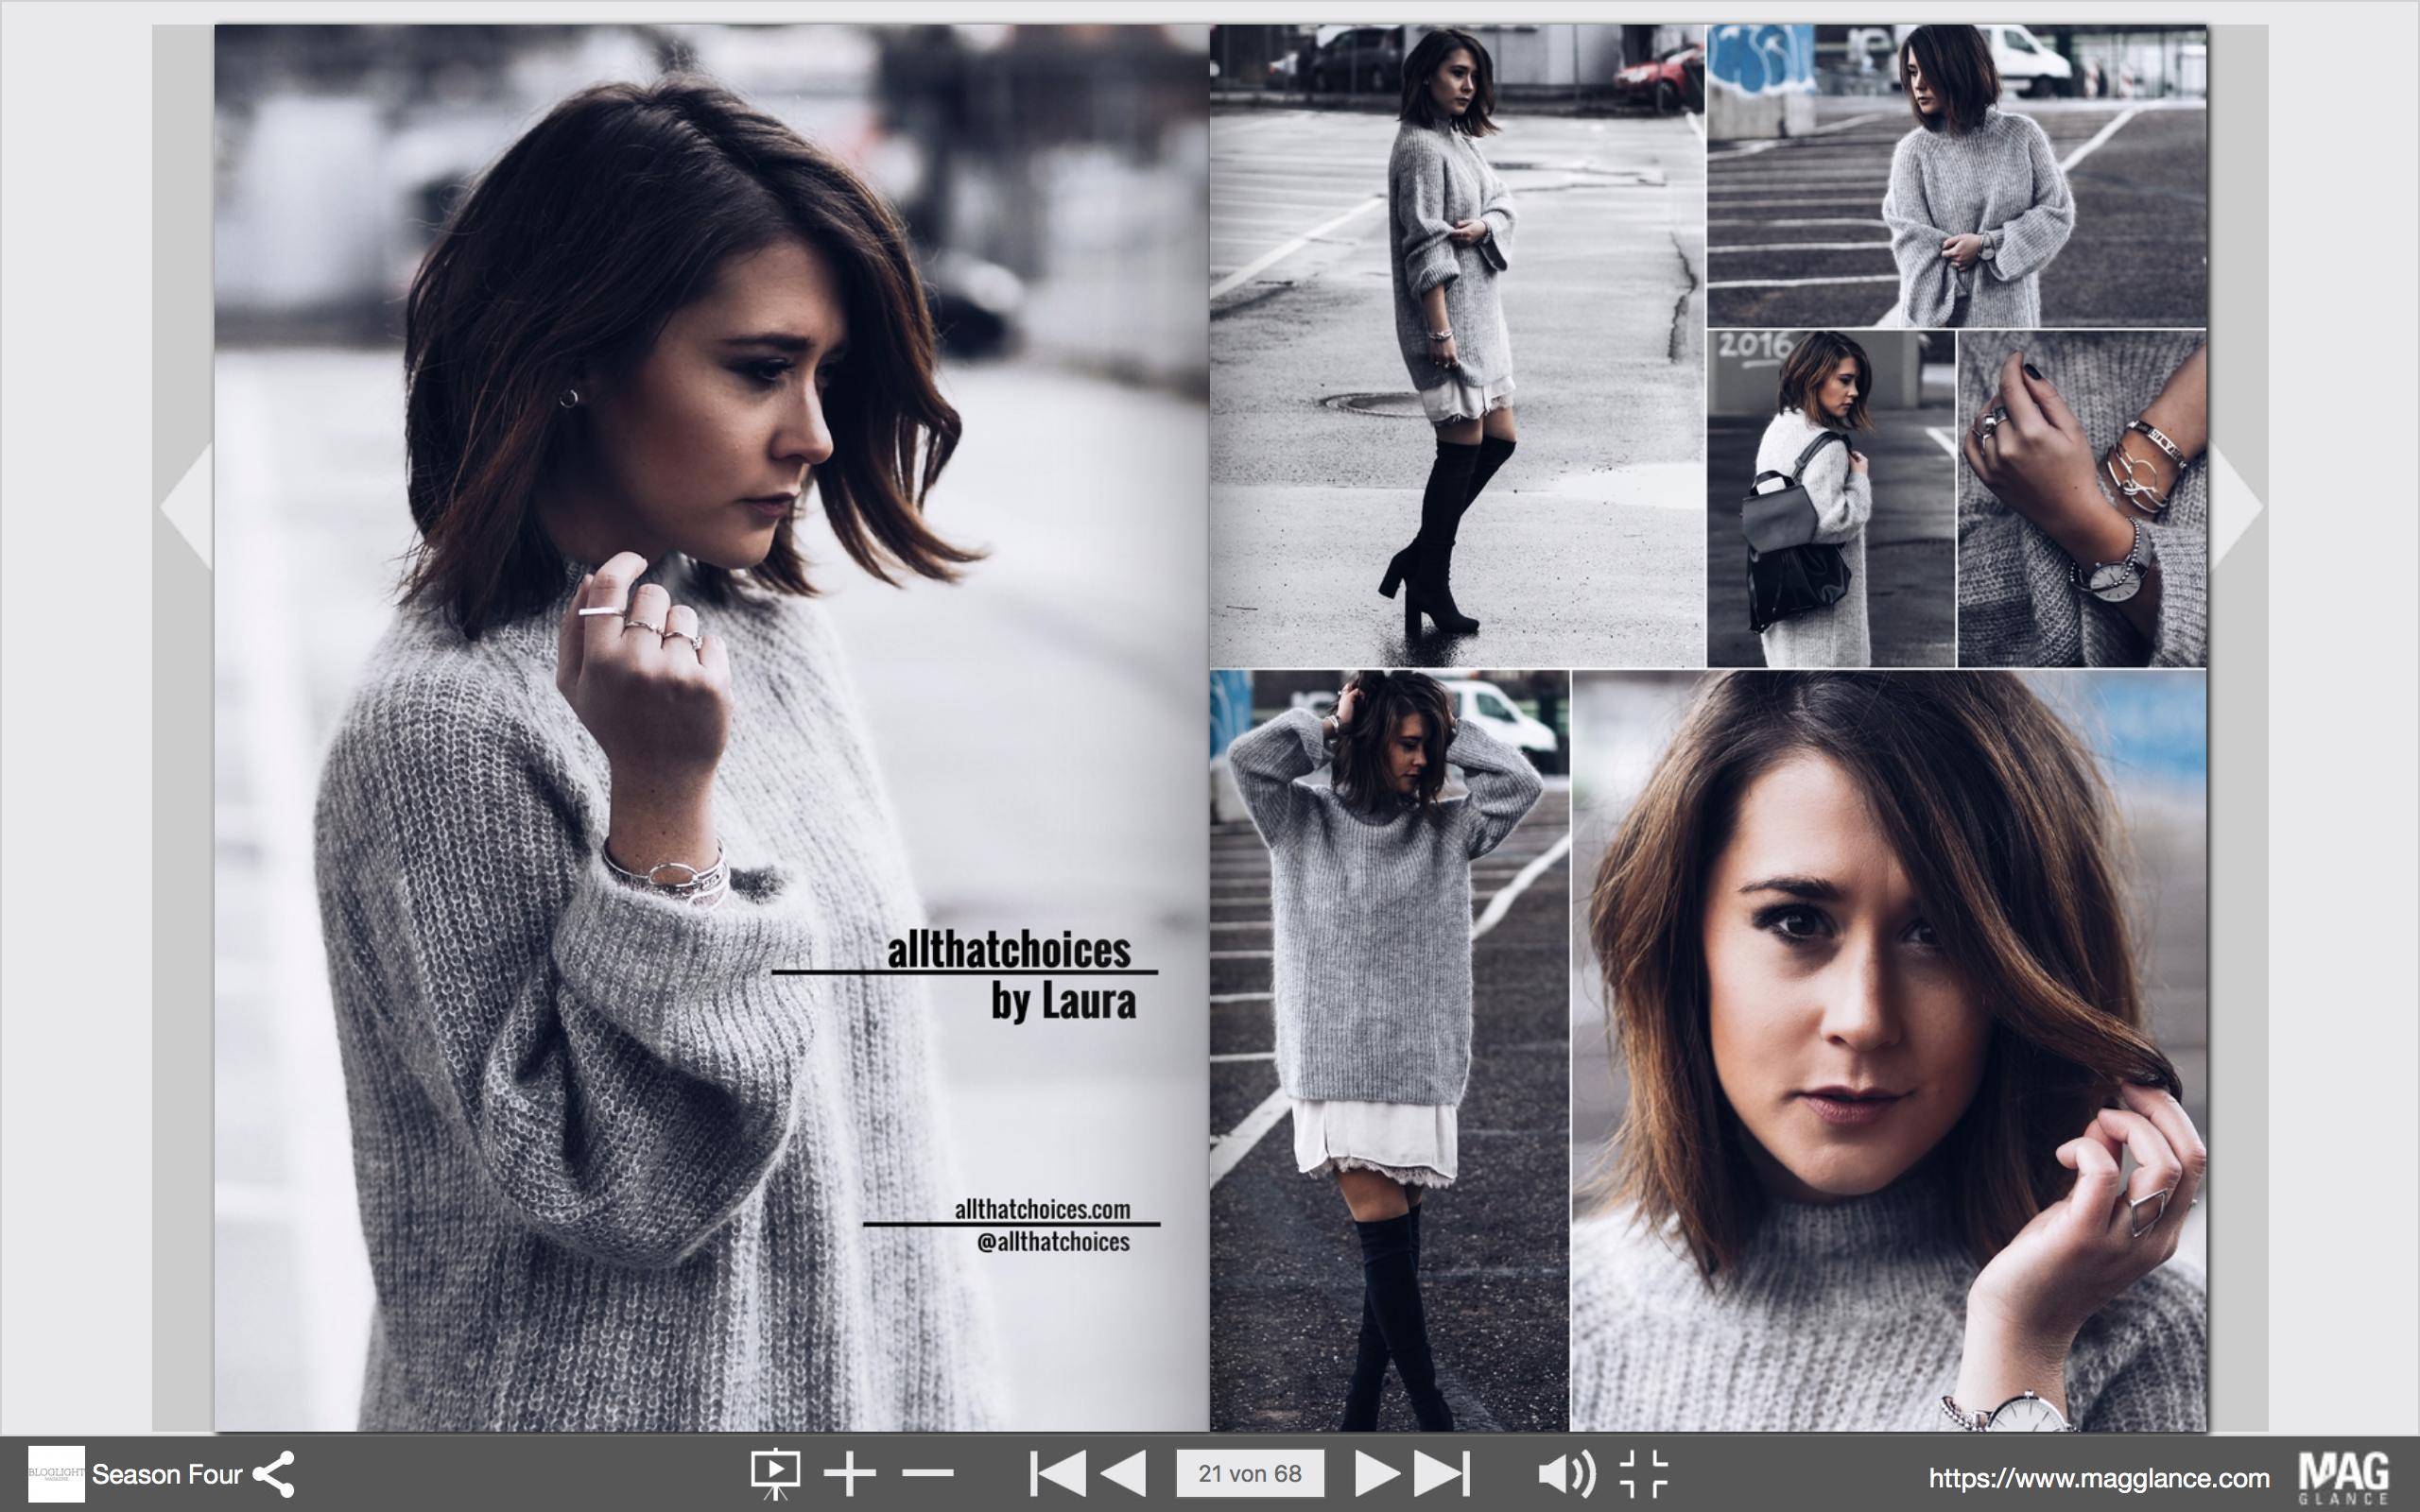 Allthatchoices by Laura Fashionblog Mainz bloglight magazin fashionblogger blog